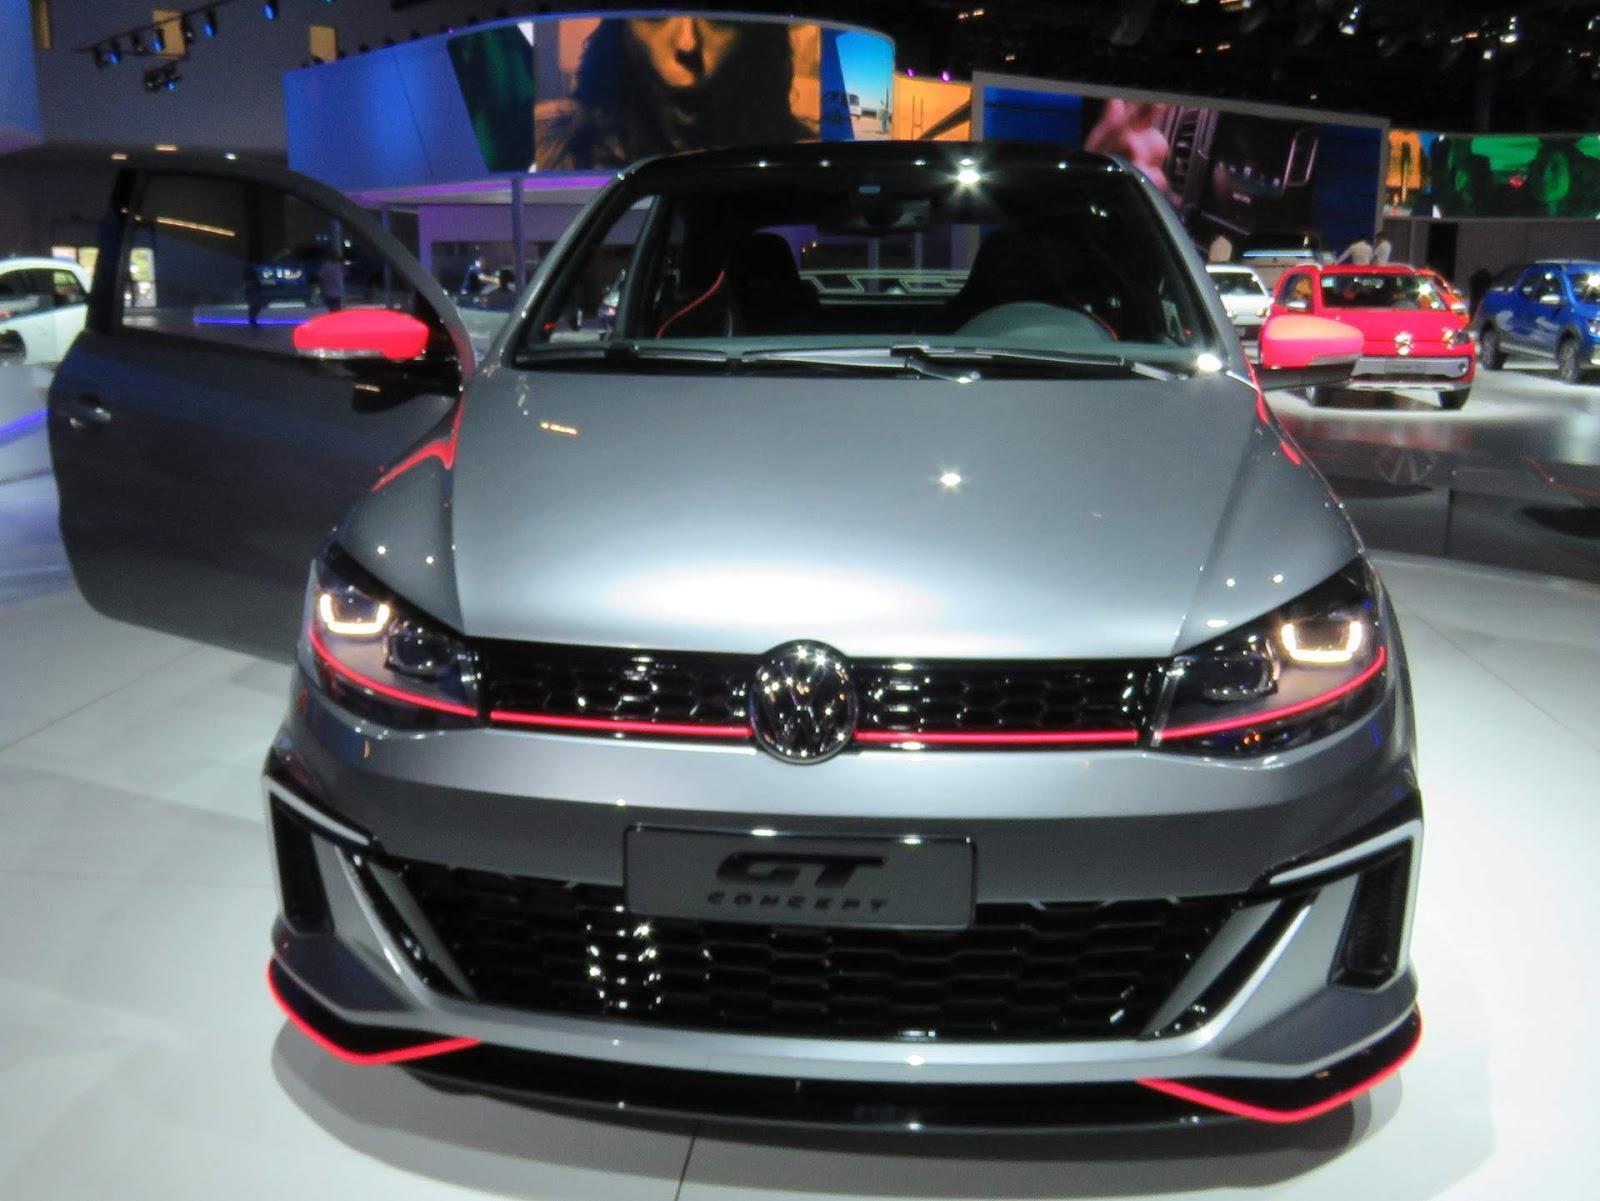 lan amento volkswagen 2018. Lan Amento Volkswagen 2018 O